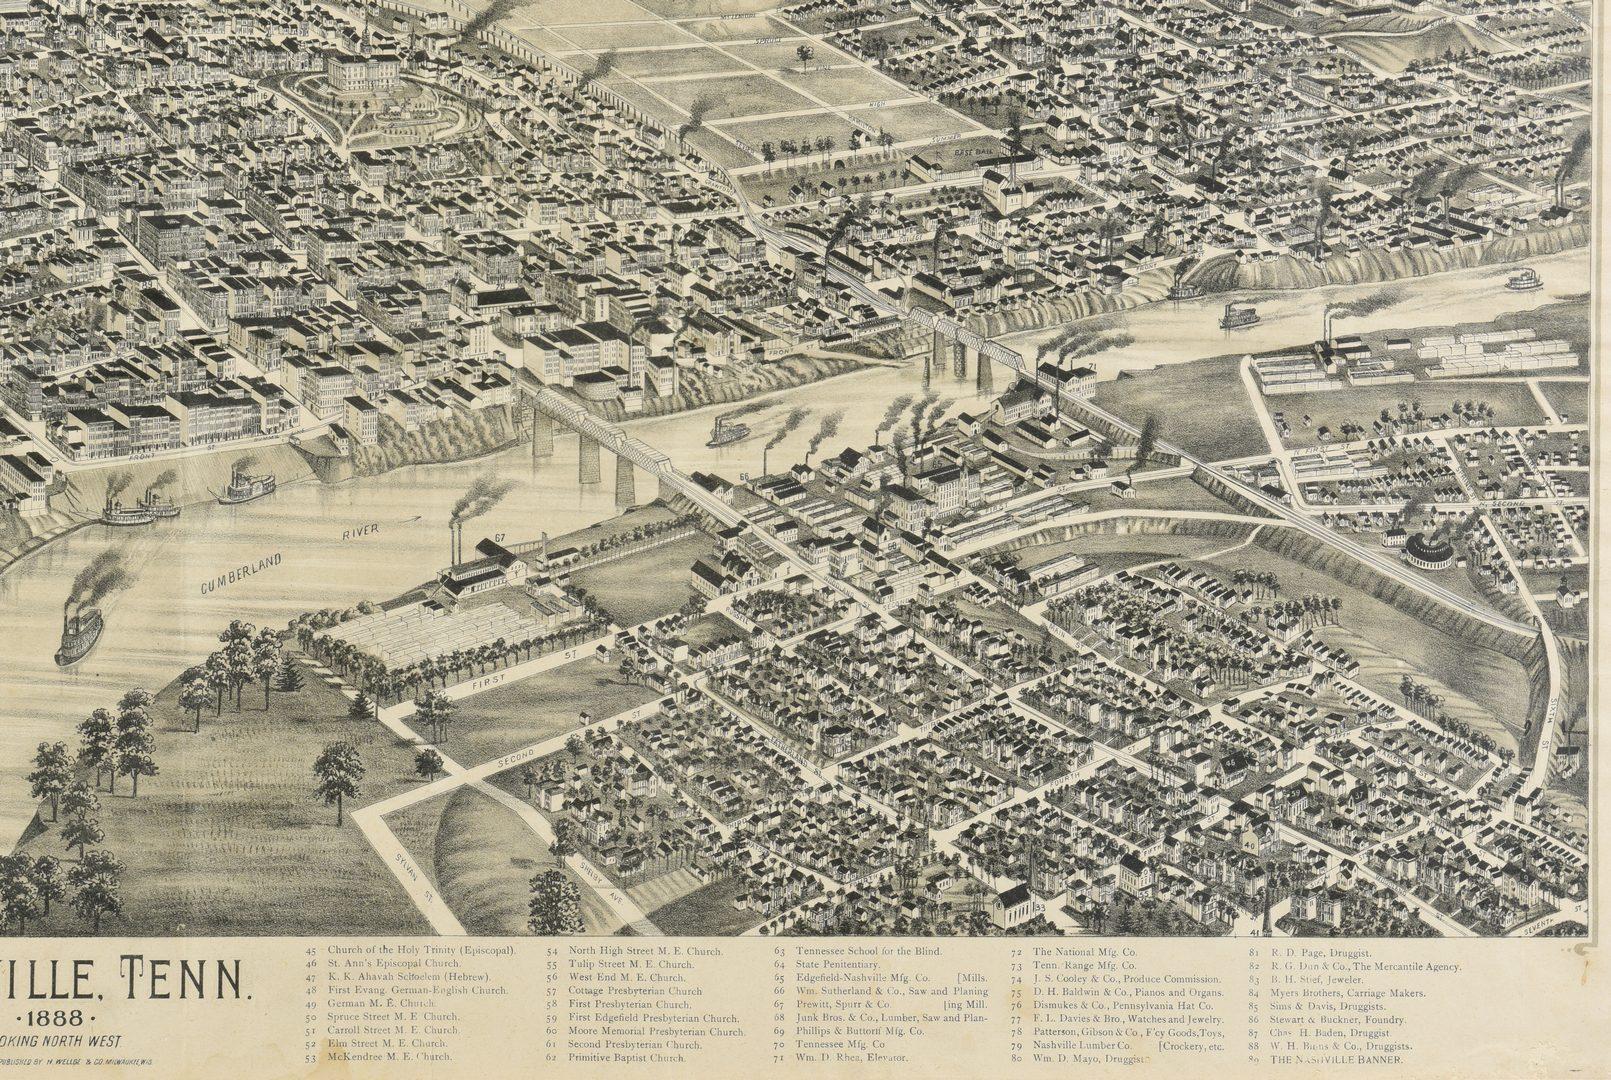 Lot 259: 1888 Birdseye View Nashville Map plus 2 Streetcar Maps